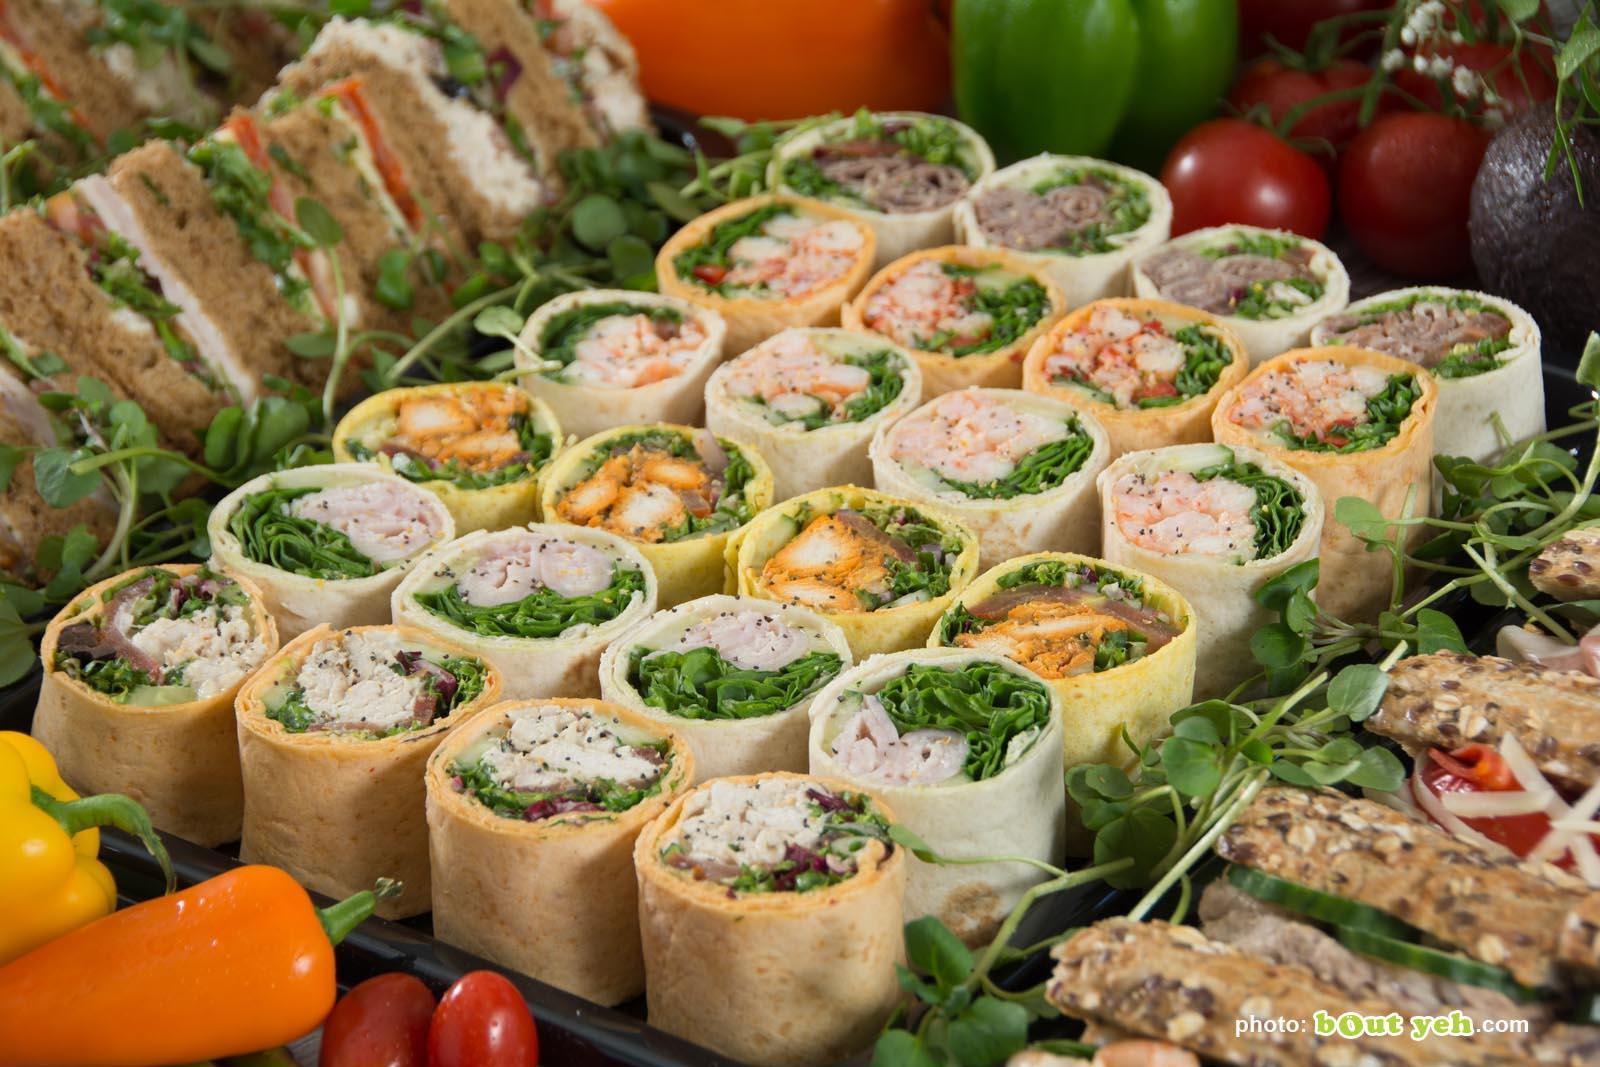 Food photographers Belfast portfolio photo 3923 - mini salad wraps